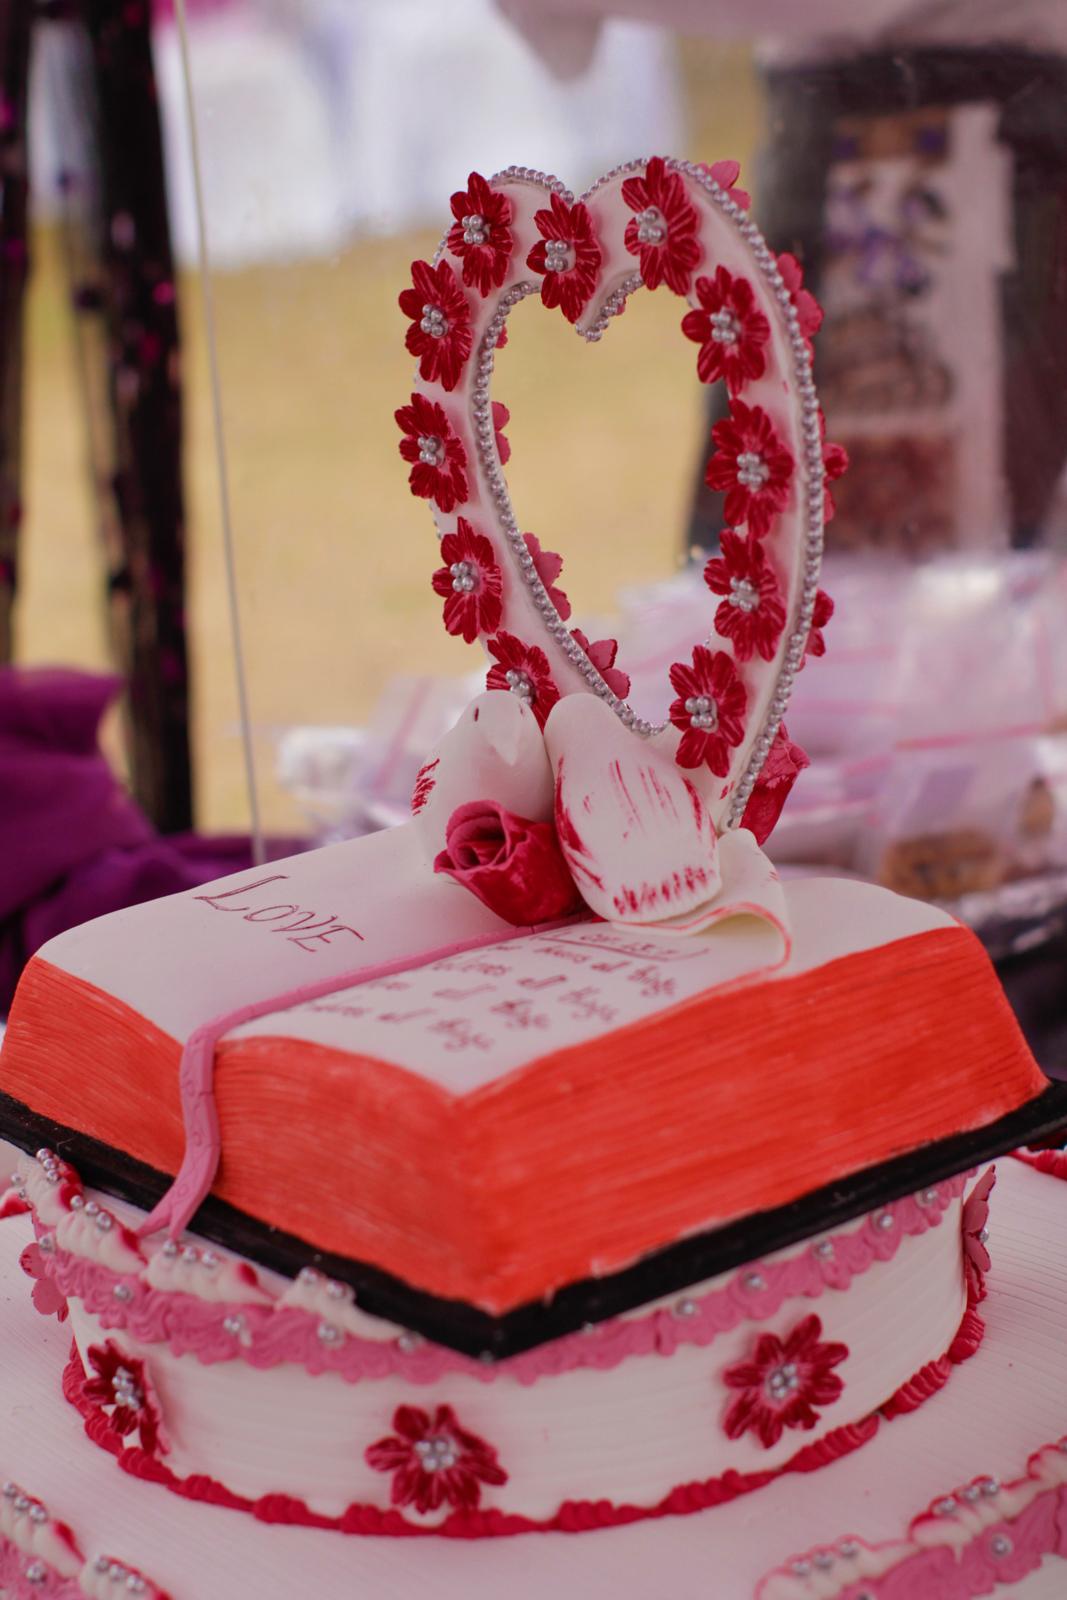 34Kenyan wedding photographer Best Nairobi Weddings –Top Kenyan Wedding Photographers – Top Kenyan Weddings –Top Nairobi Wedding Photographers –Best Kenyan Wedding Photographers –Best Nairobi Wedding Photography-